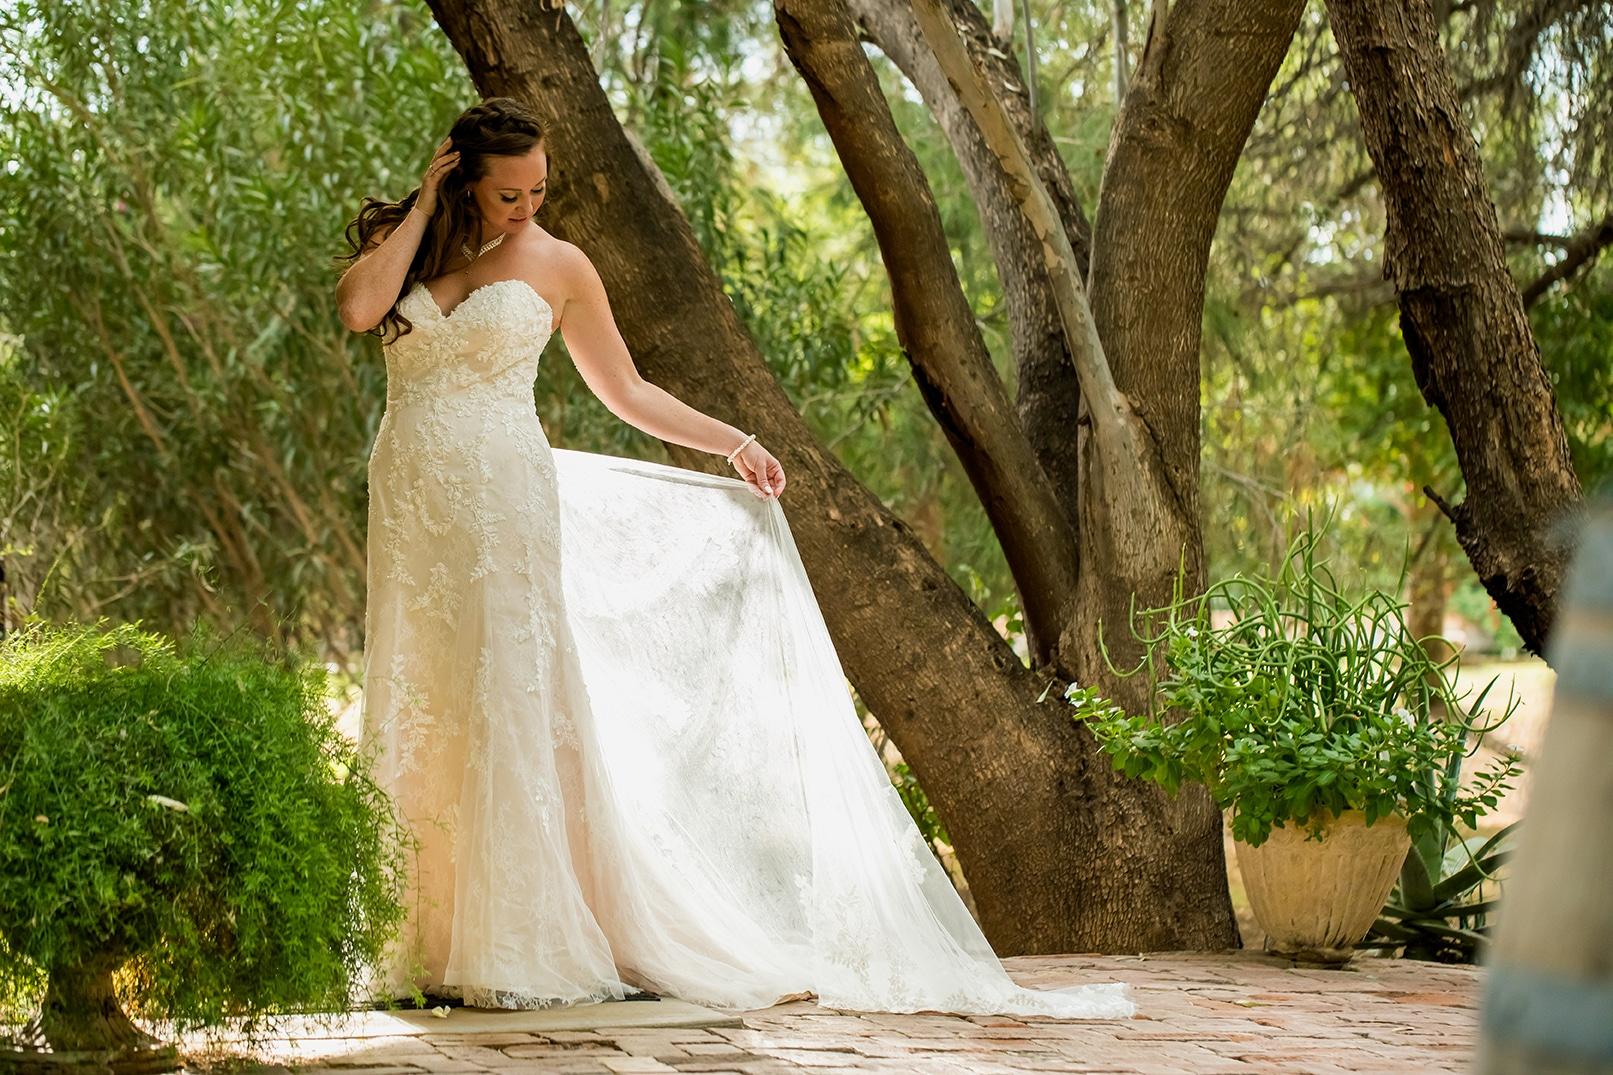 Windmill Winery Wedding - Wedding Photographer SWP